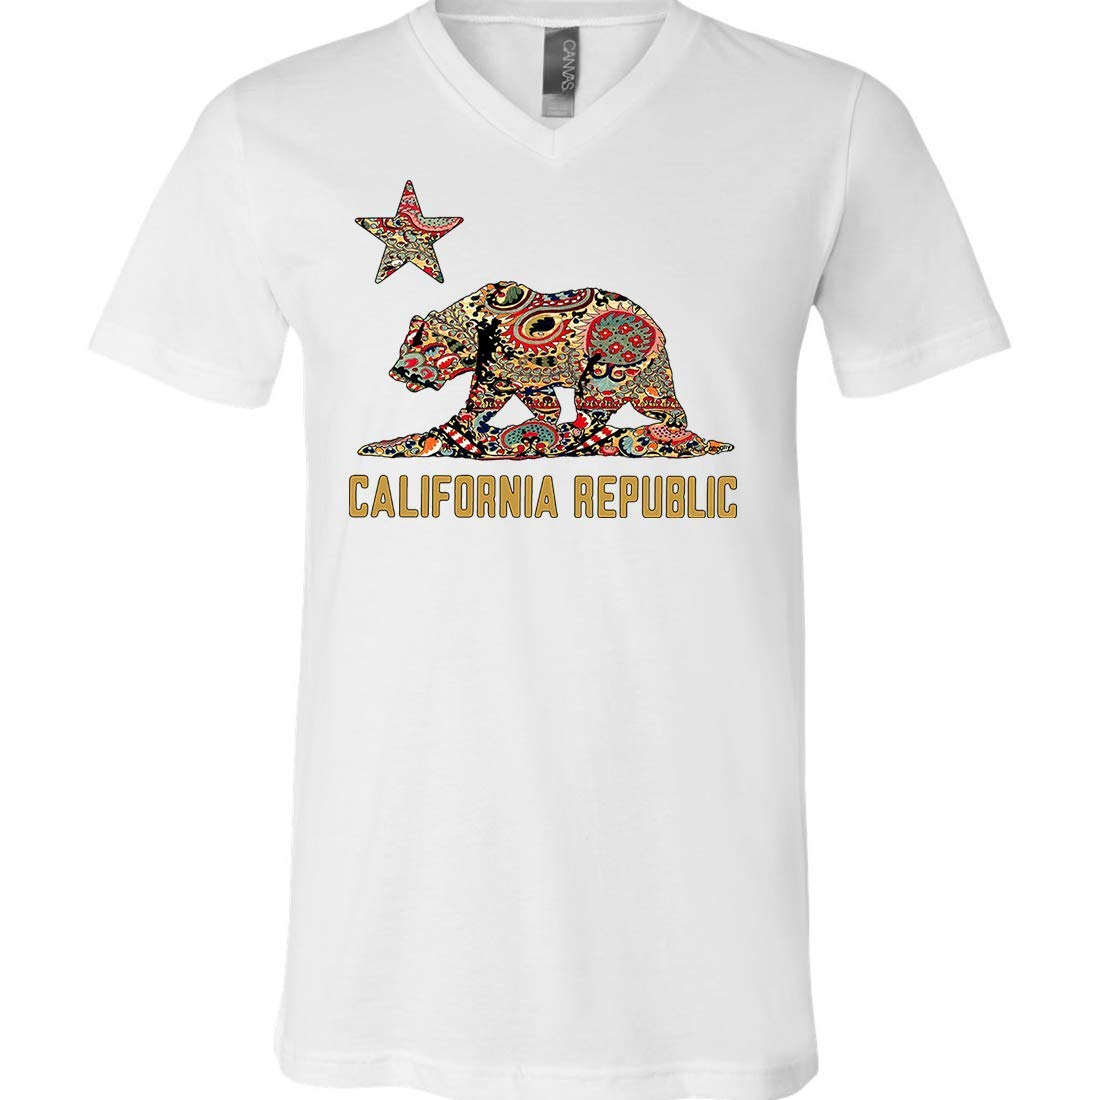 Dolphin Shirt Co California Republic Paisley Bear Asst Colors Vneck